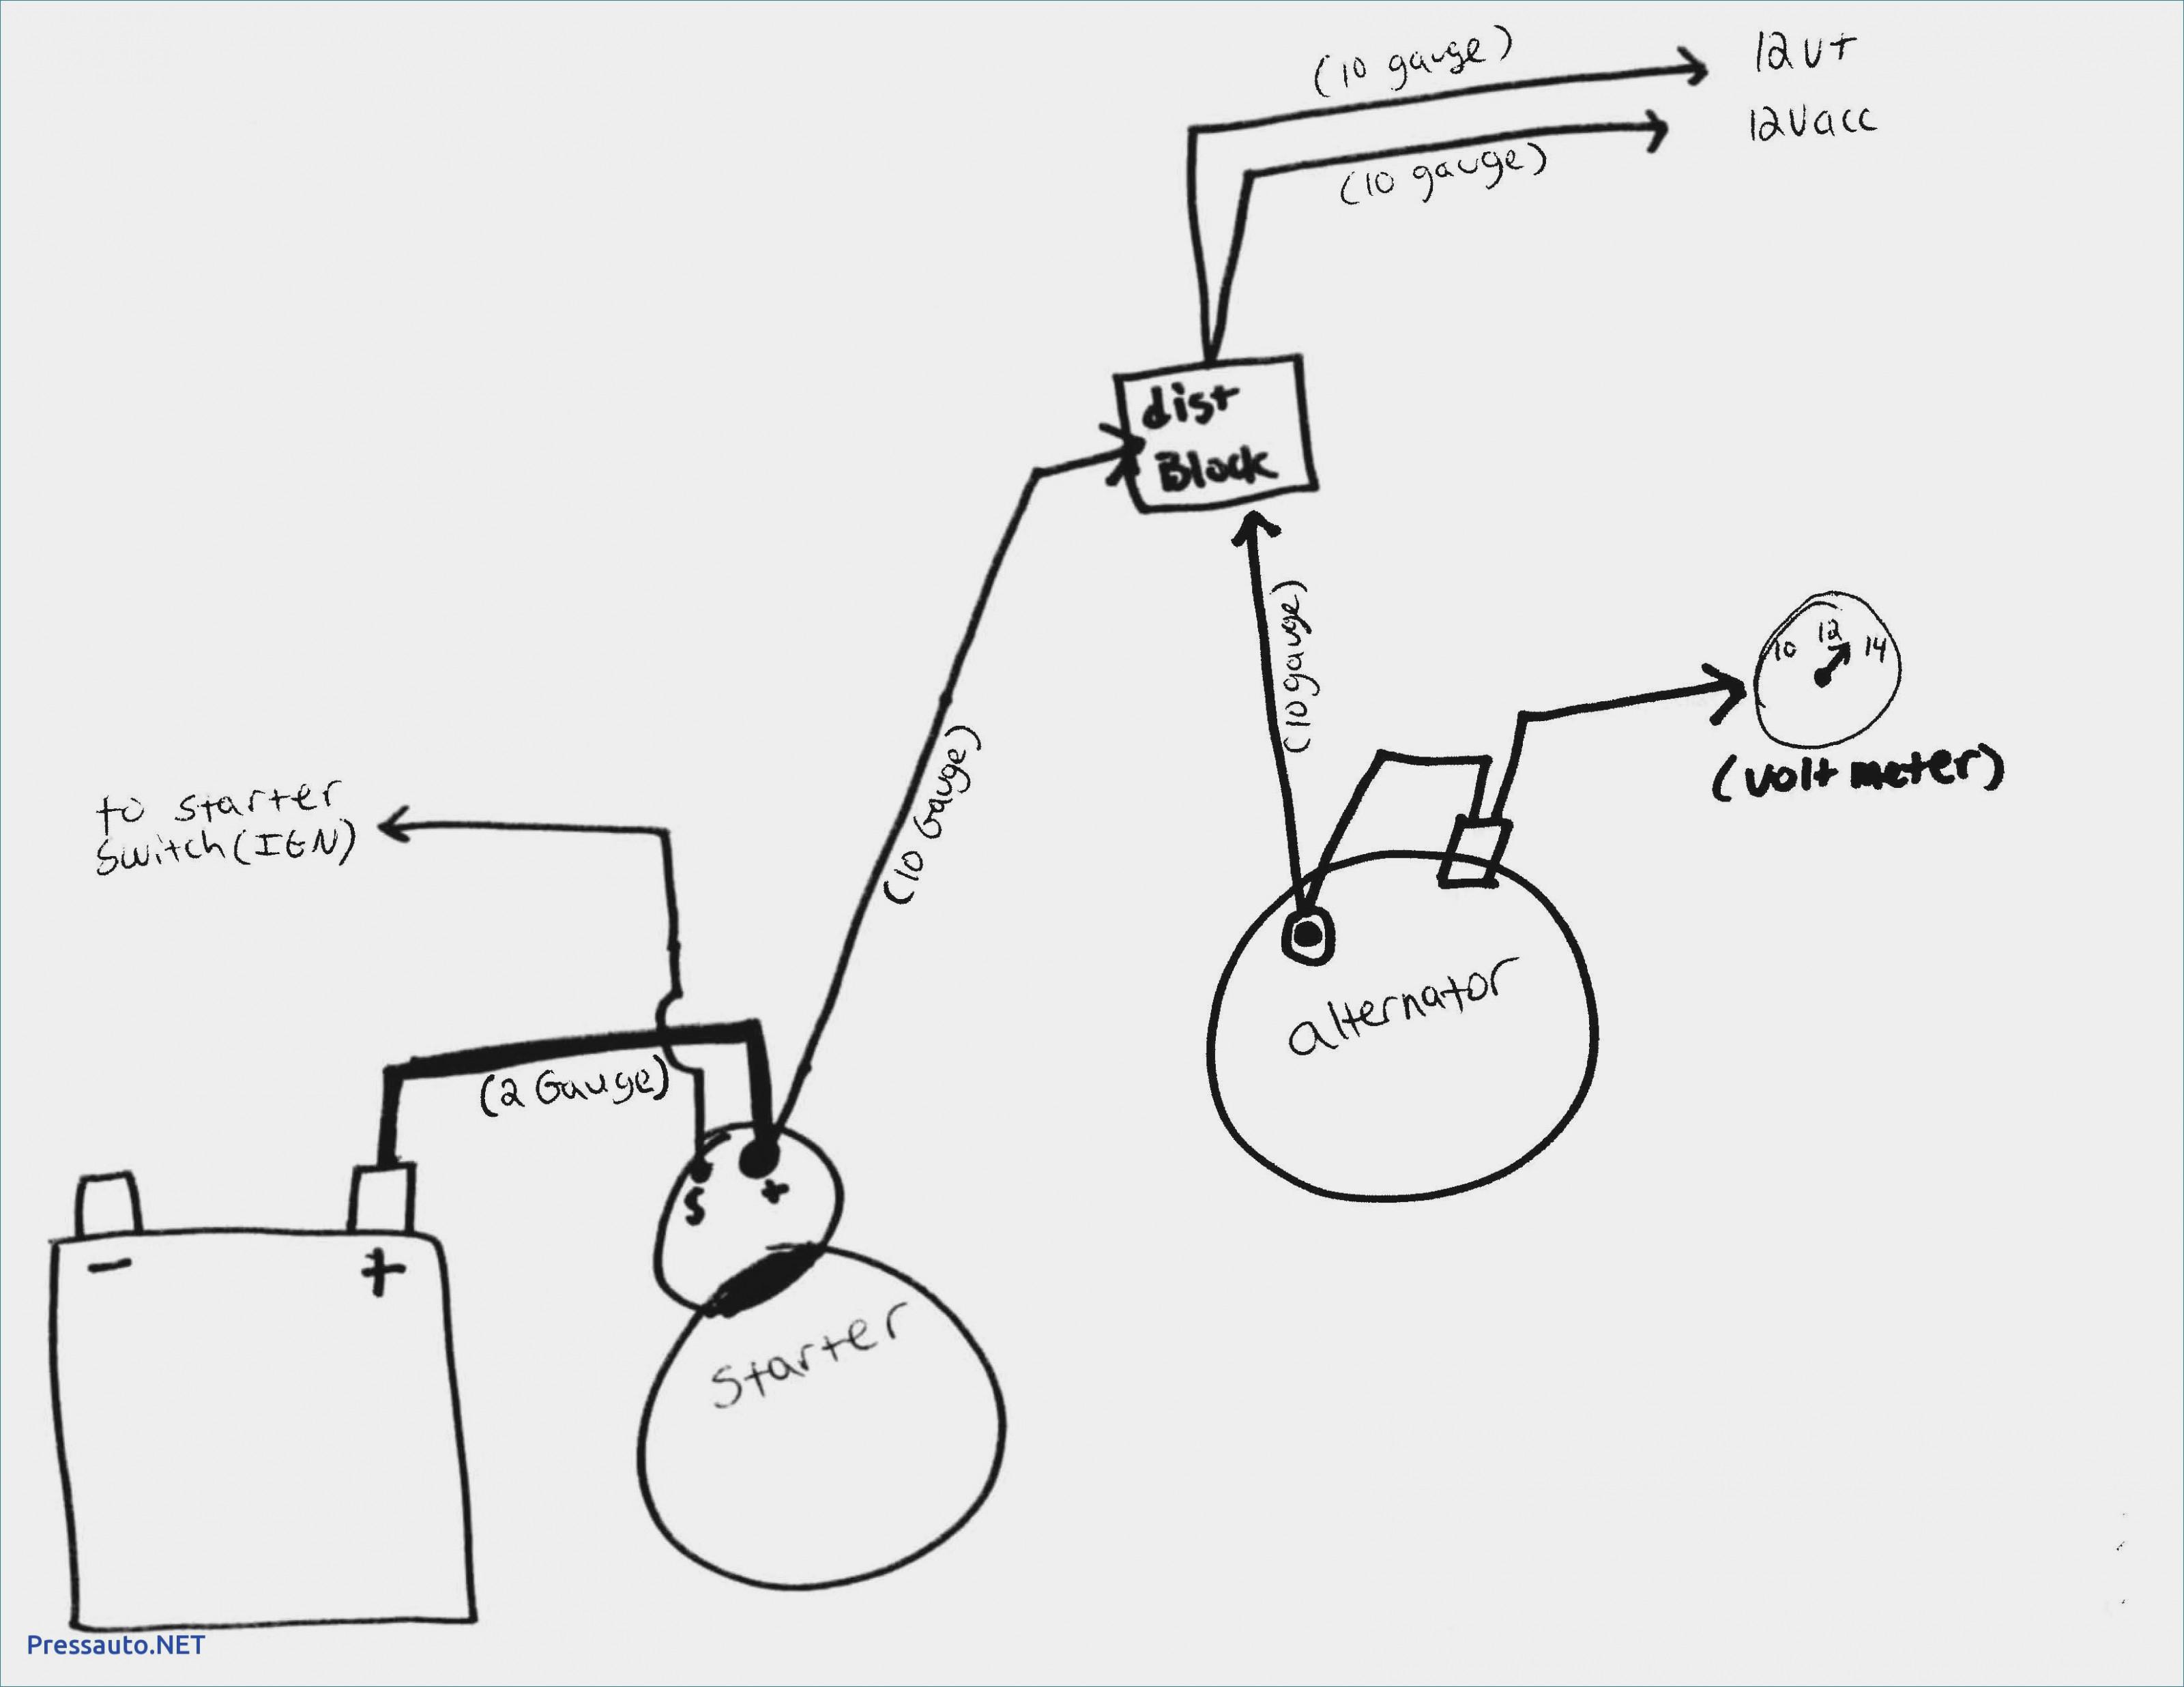 One Wire Diagram   Wiring Diagram - Gm Alternator Wiring Diagram